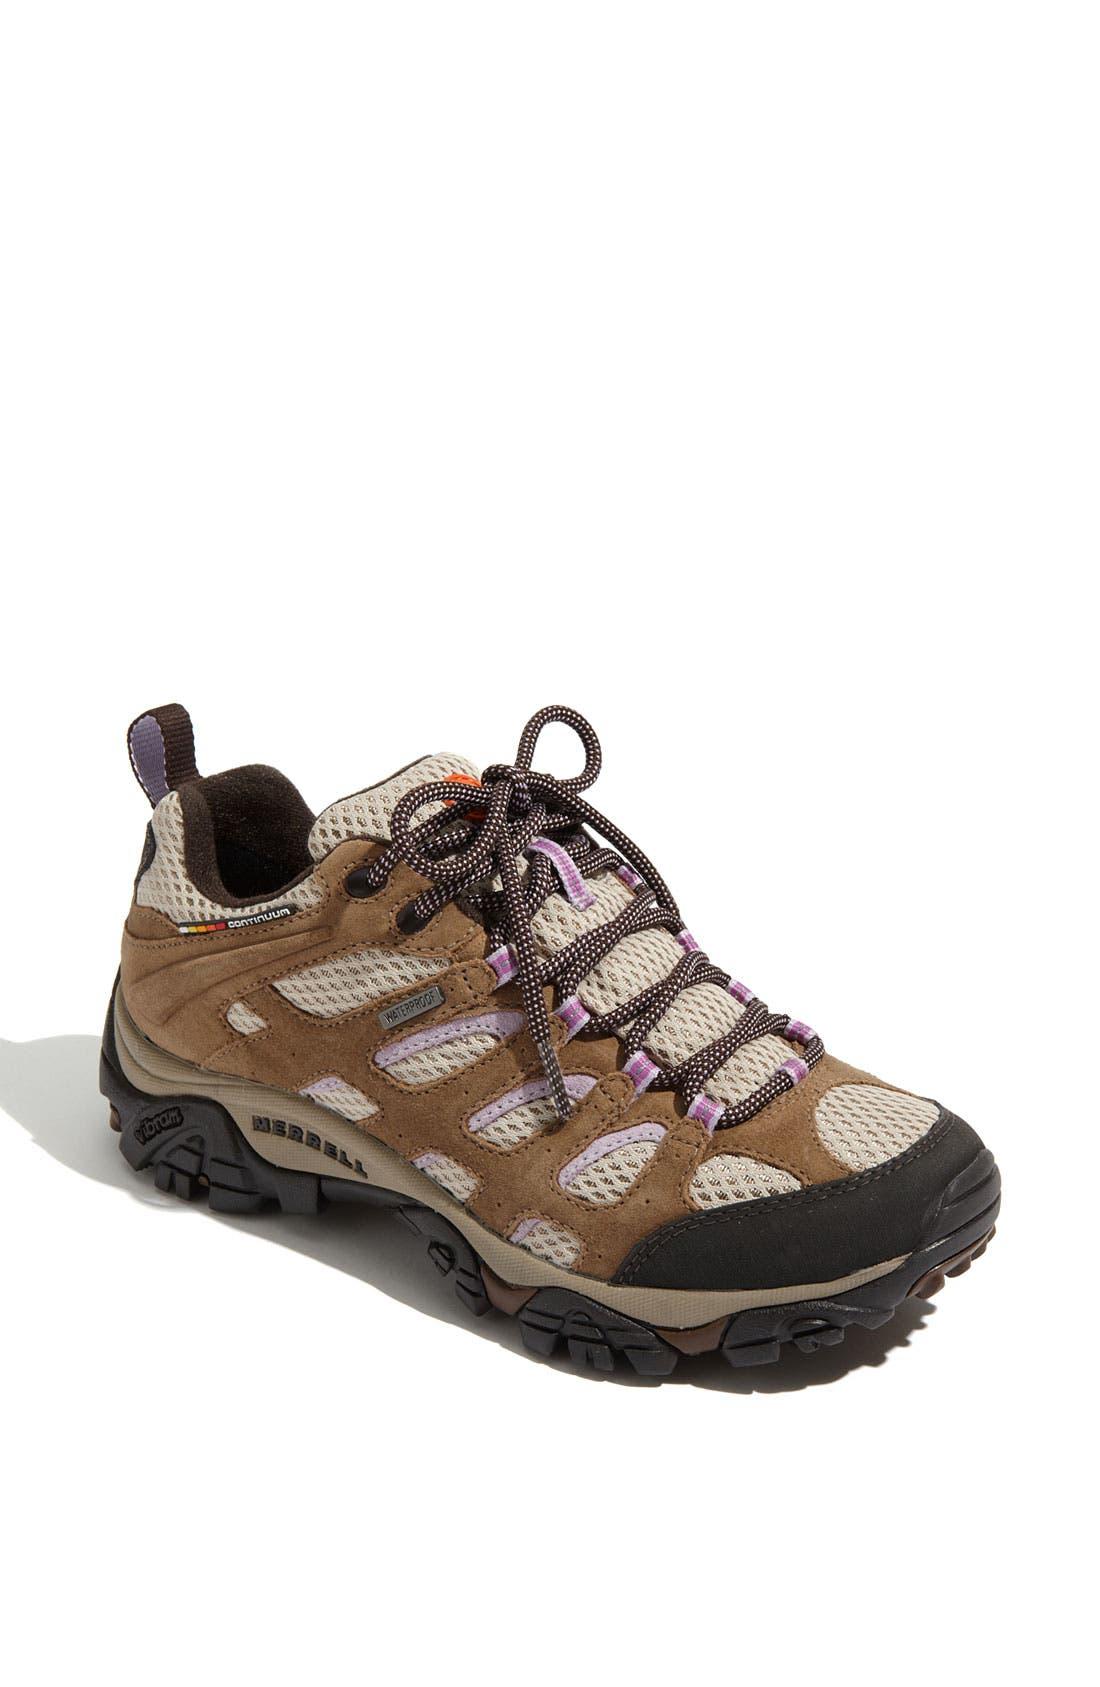 Main Image - Merrell 'Moab Waterproof' Trail Shoe (Women)